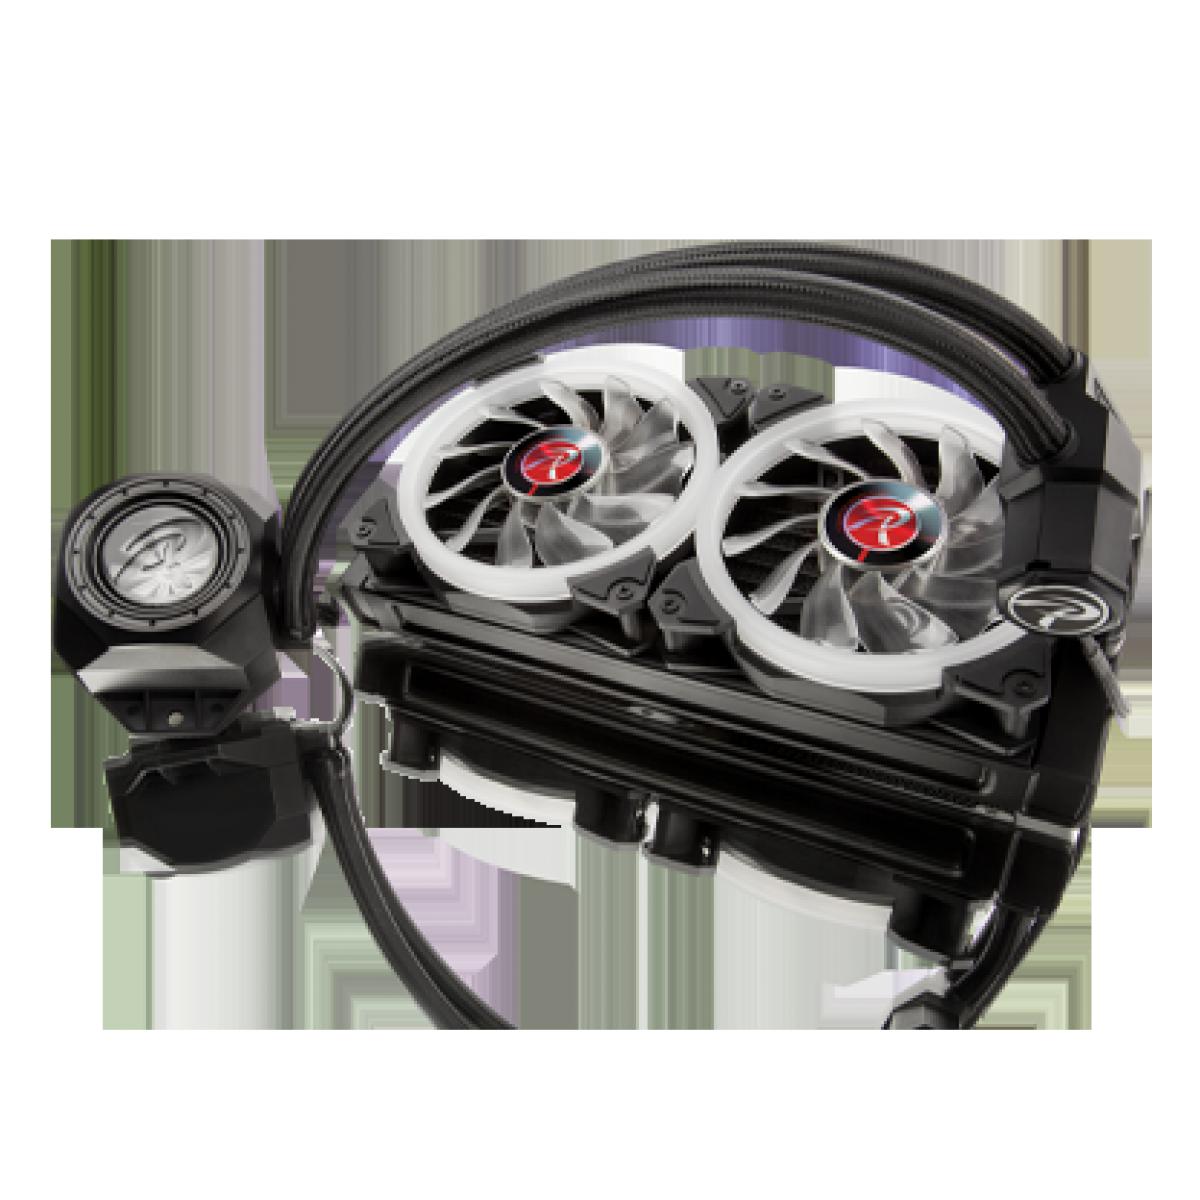 Water Cooler Raijintek ORCUS 240 RBW, 240mm, Intel-AMD, 0R10B00105